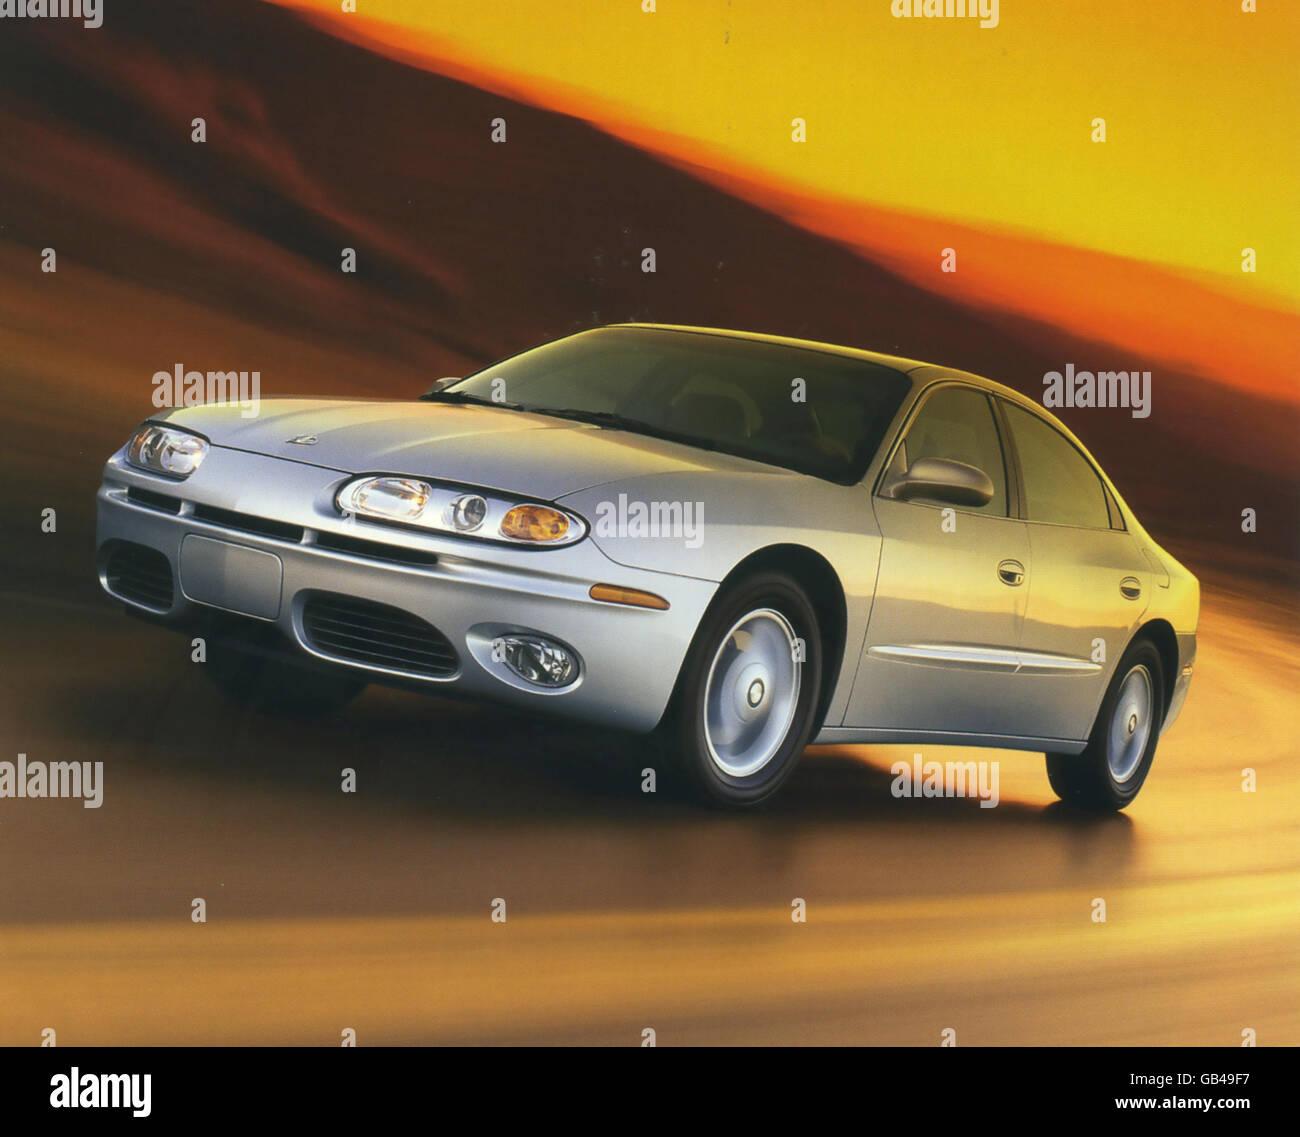 OLDSMOBILE AURORA sports sedan 1999. Photo General Motors - Stock Image